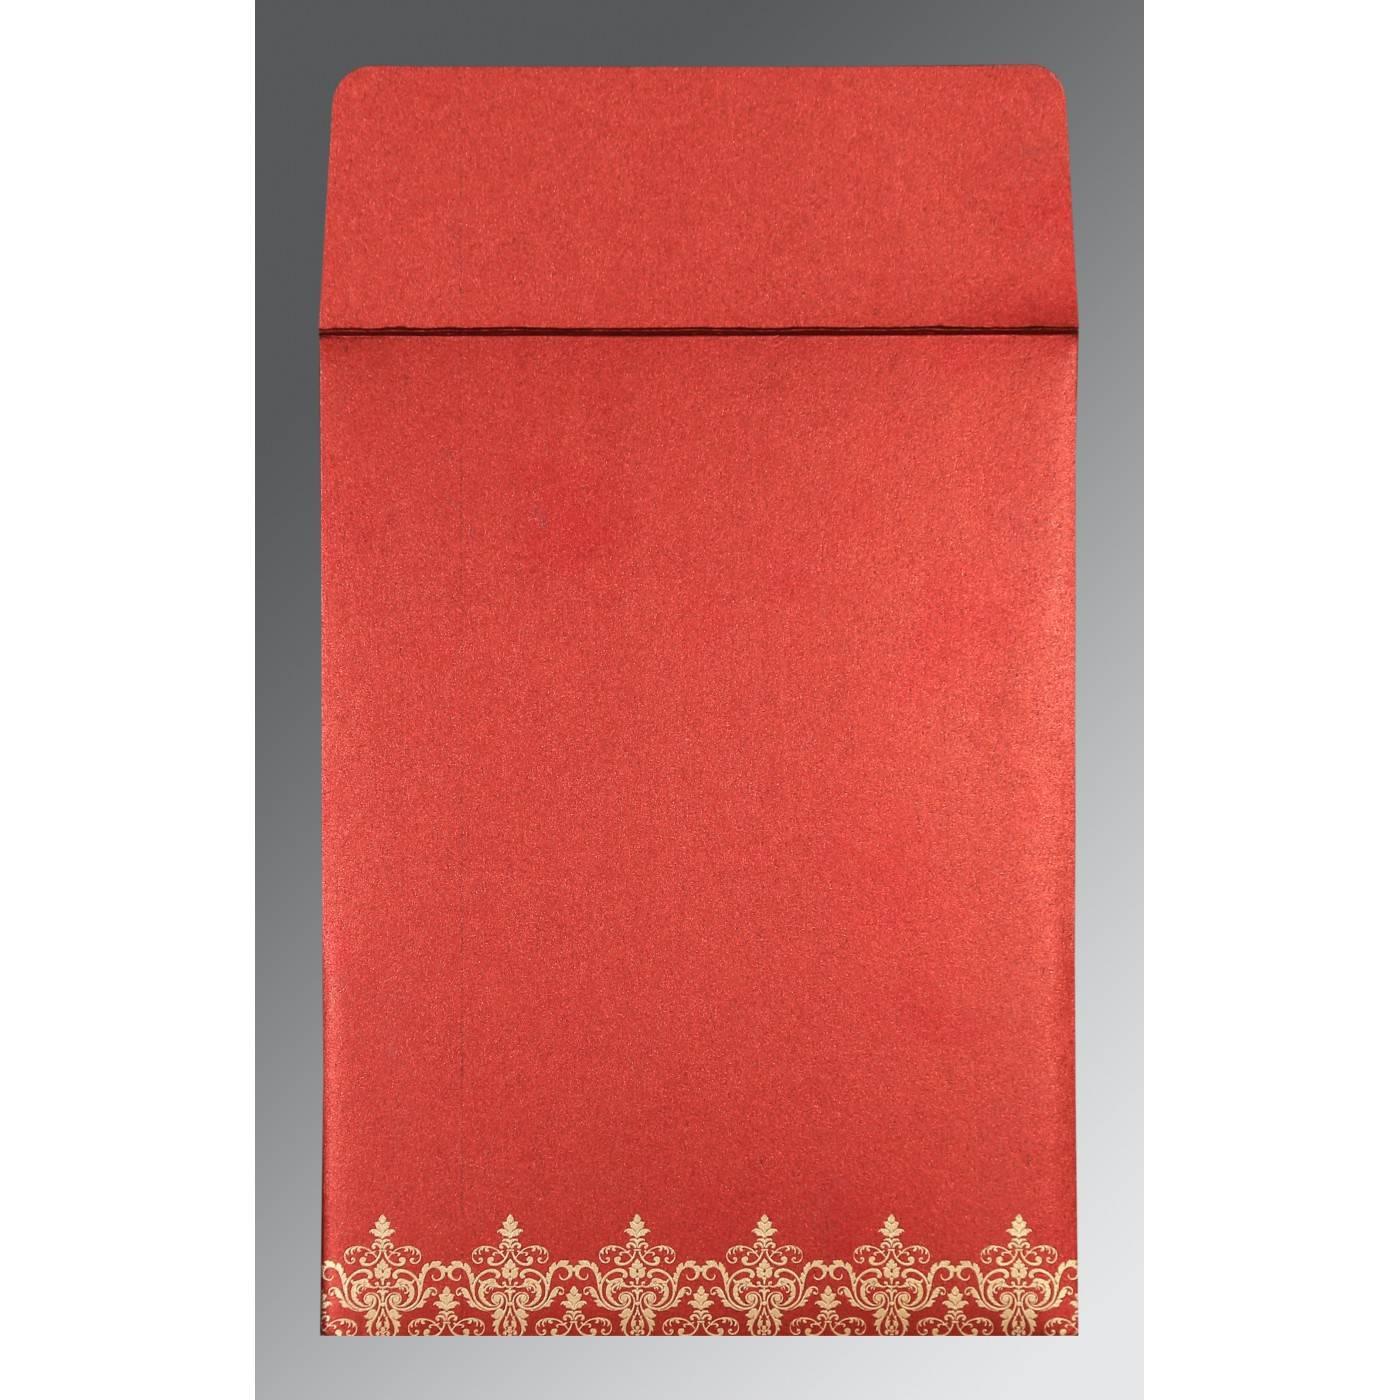 WINE RED SHIMMERY SCREEN PRINTED WEDDING CARD : CIN-8244E - IndianWeddingCards